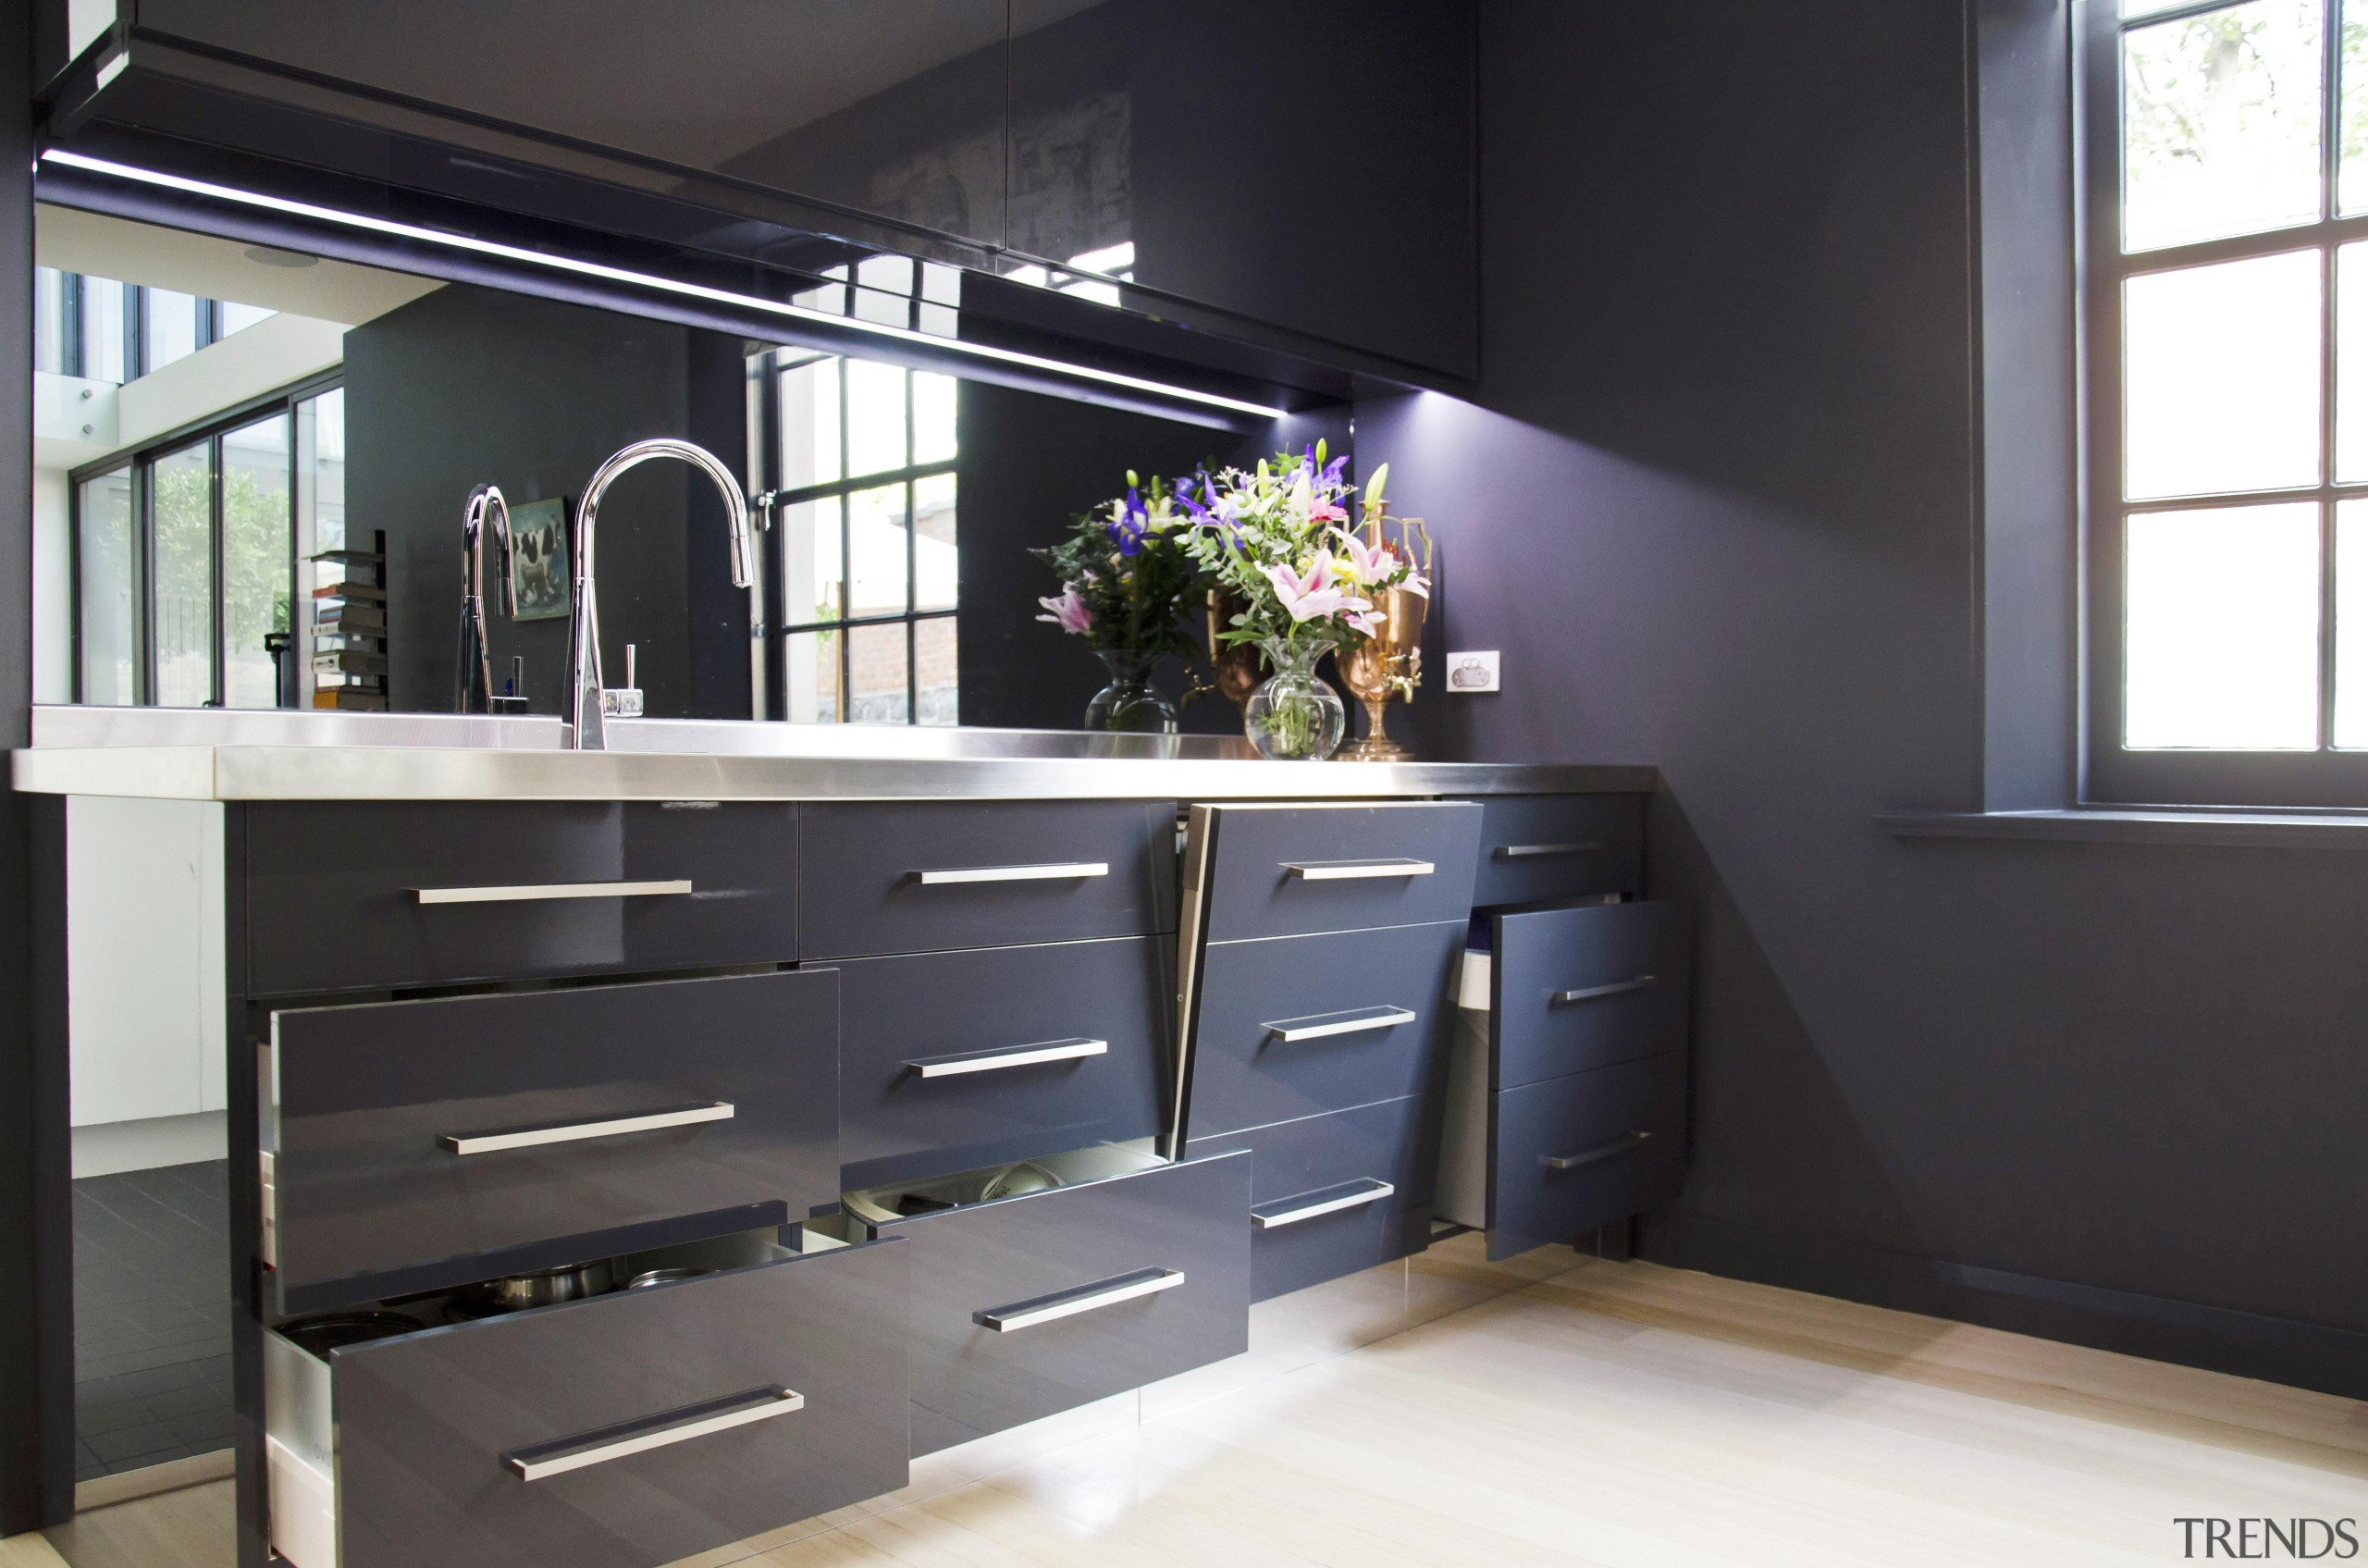 Winner Kitchen Design and Kitchen of the Year furniture, interior design, kitchen, product, product design, black